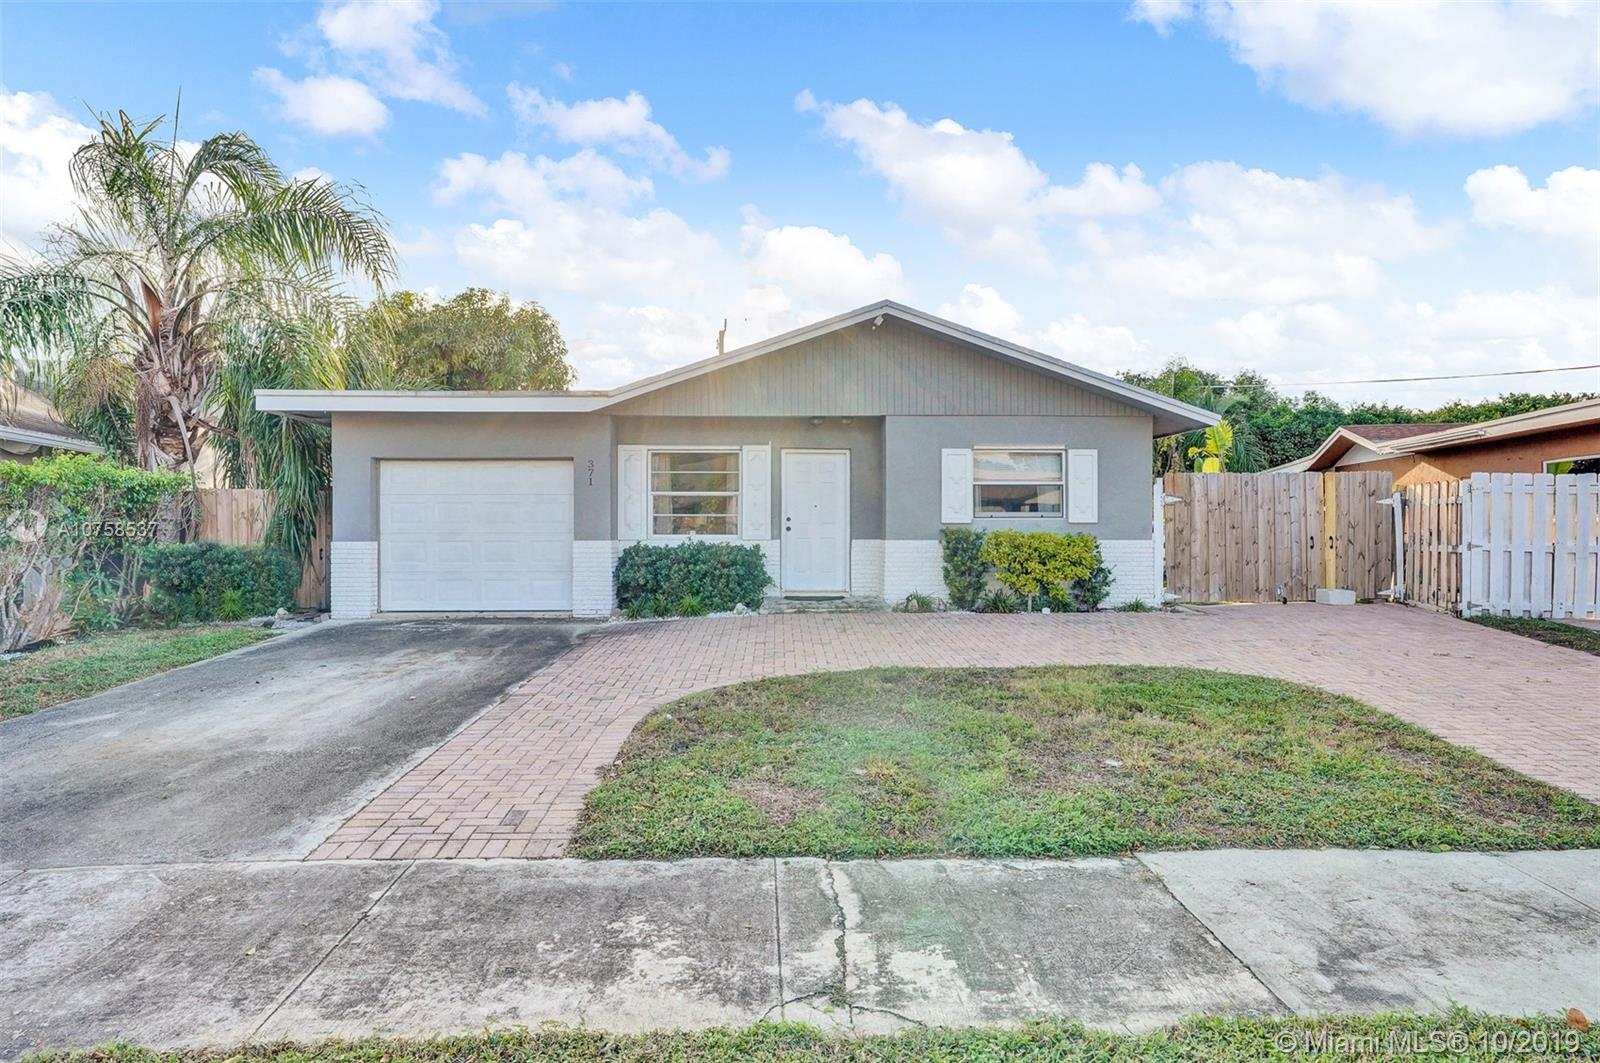 371 SW 33rd Ave, Deerfield Beach, FL 33442